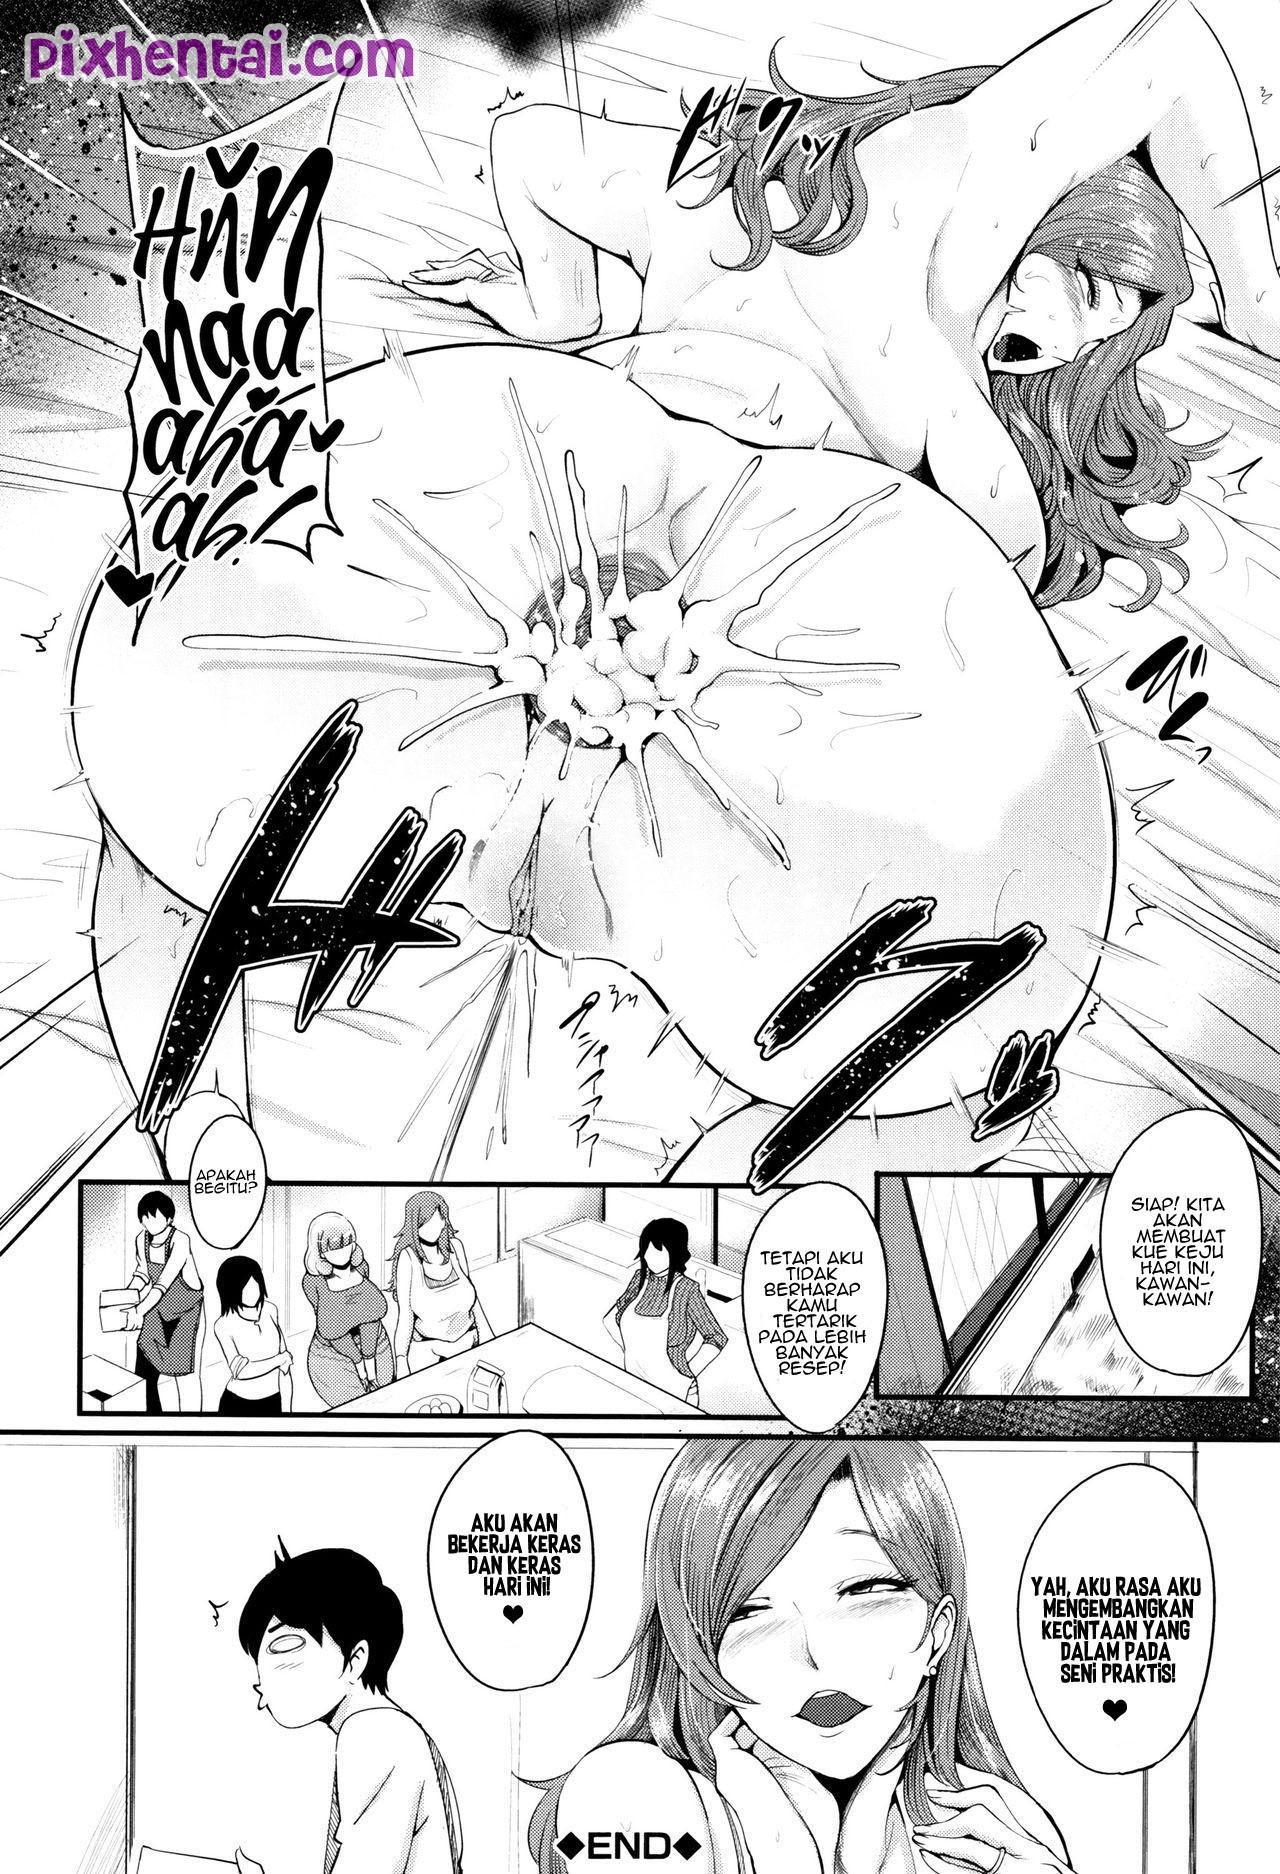 Komik hentai xxx manga sex bokep daya tarik seks teman-teman ibu 30